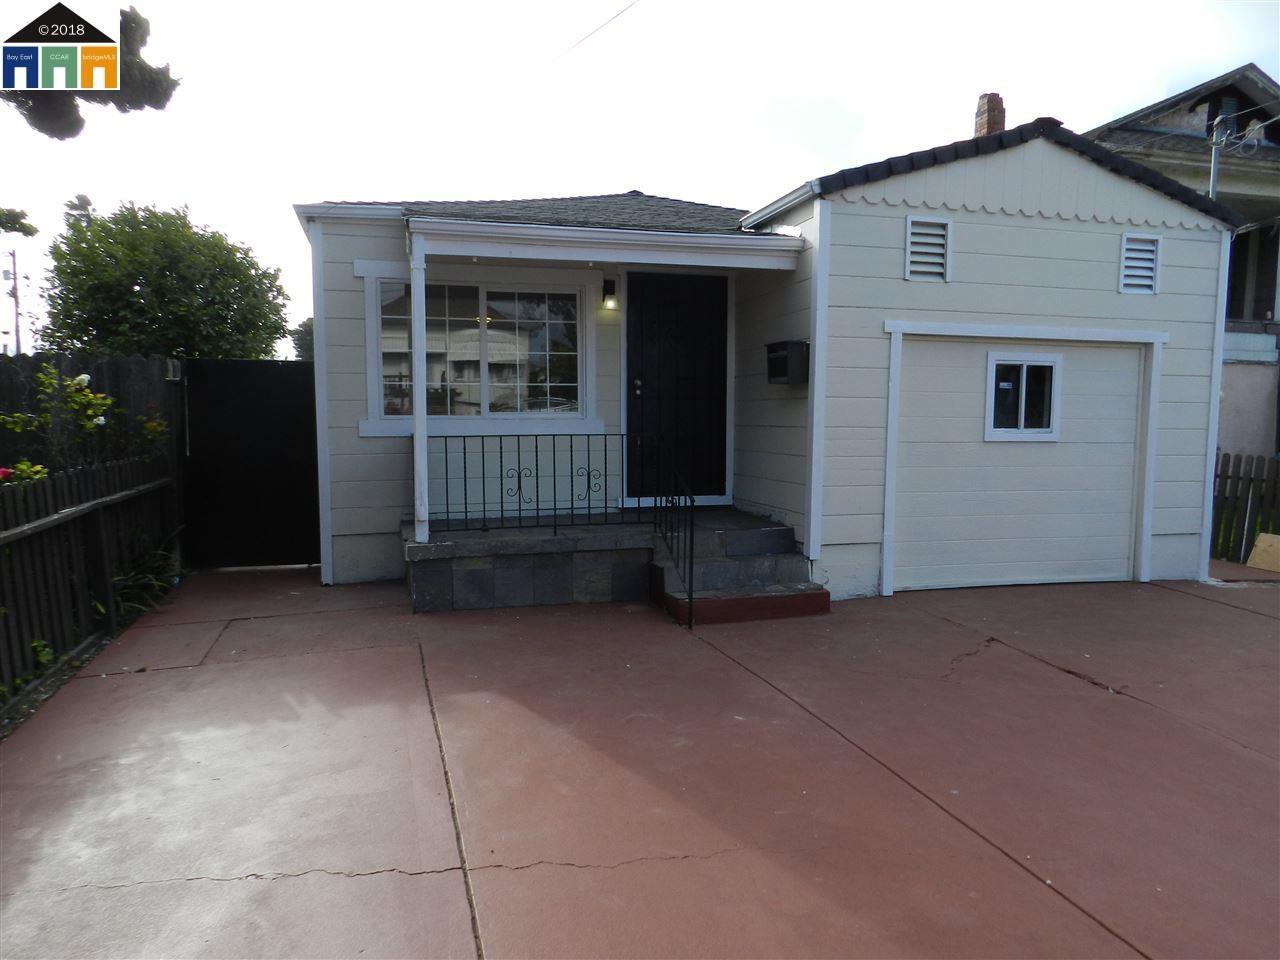 1414 24TH ST, RICHMOND, CA 94806